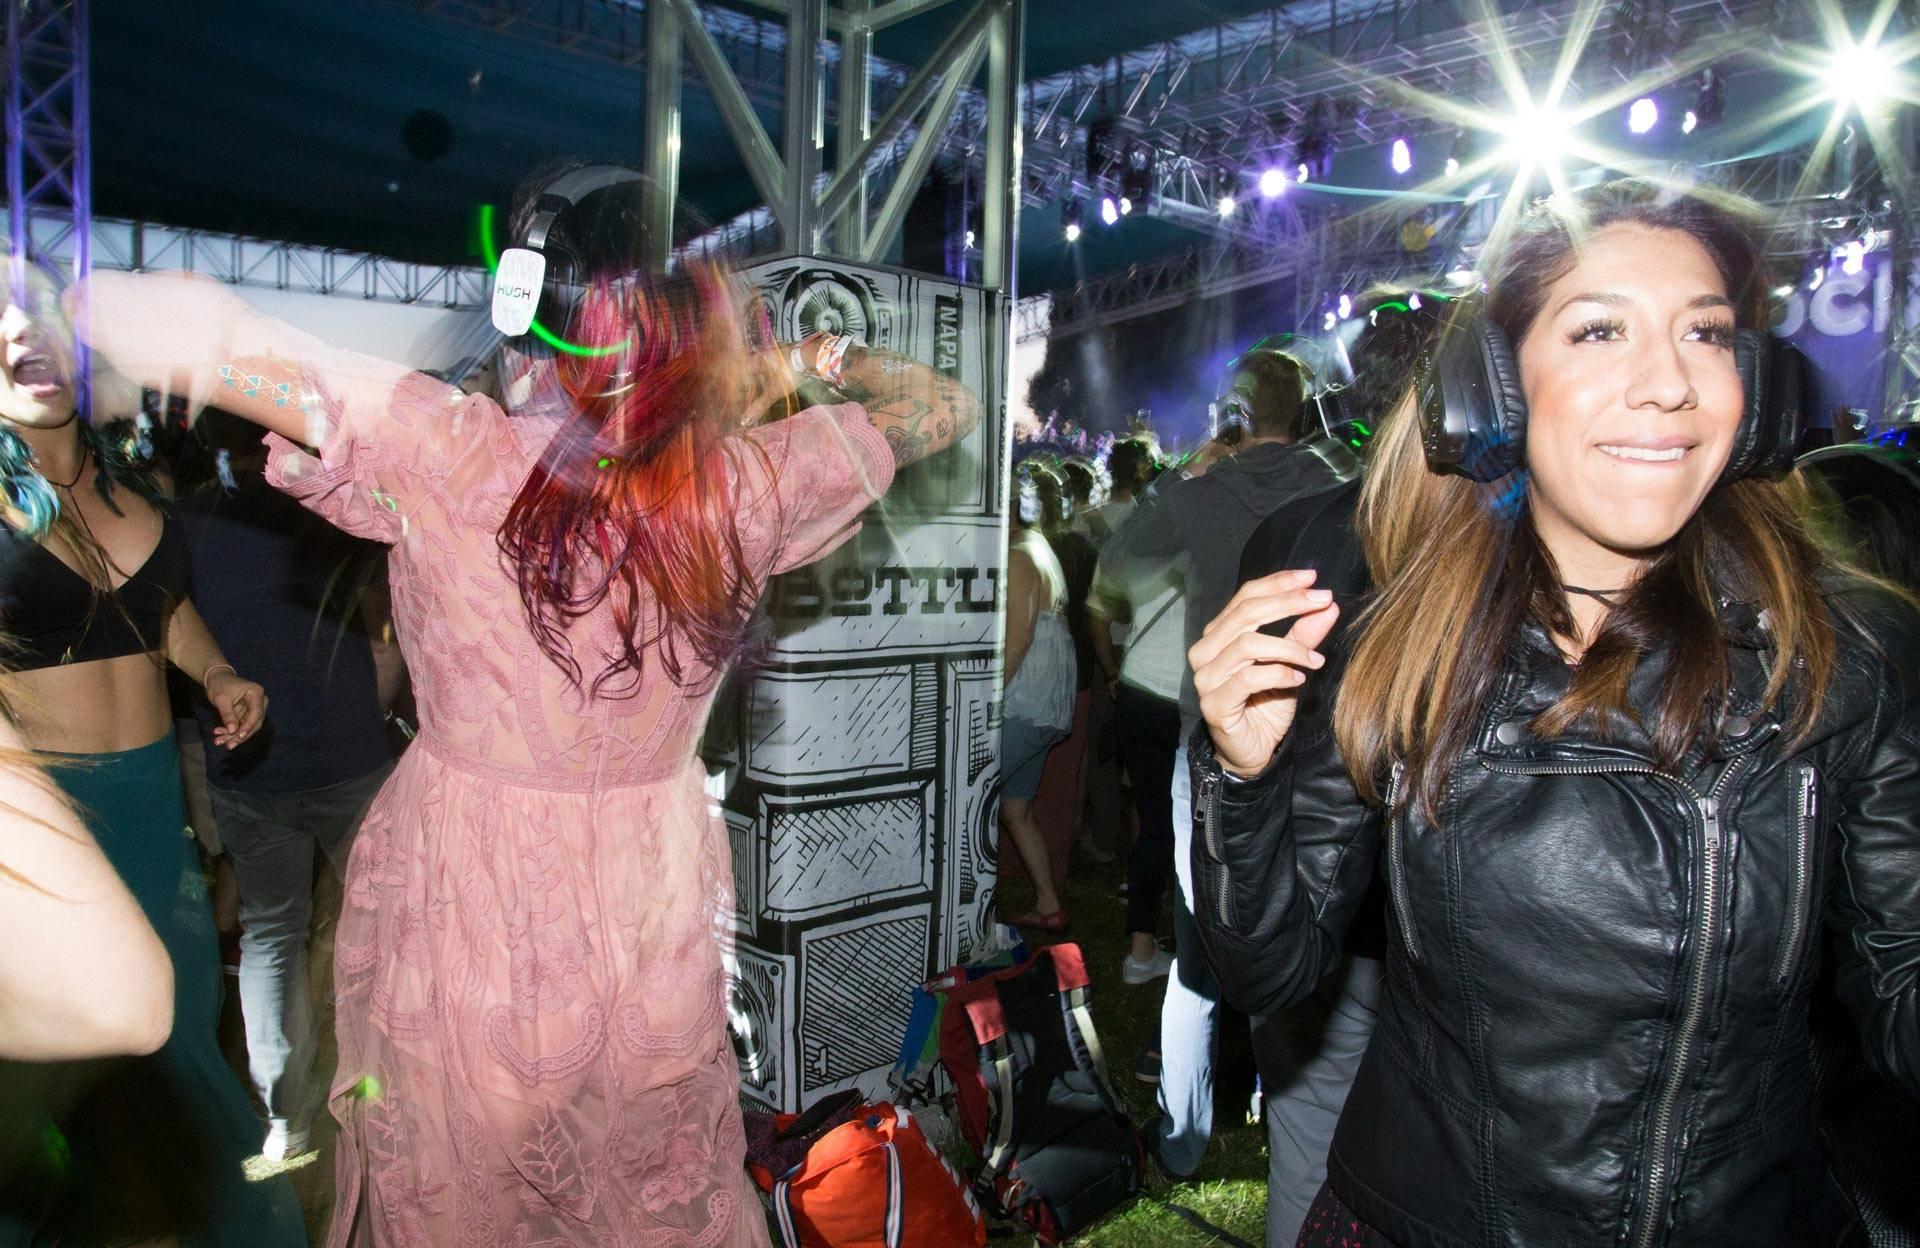 Participants in the massive Silent Disco at BottleRock in Napa, May 27, 2017. Estefany Gonzalez